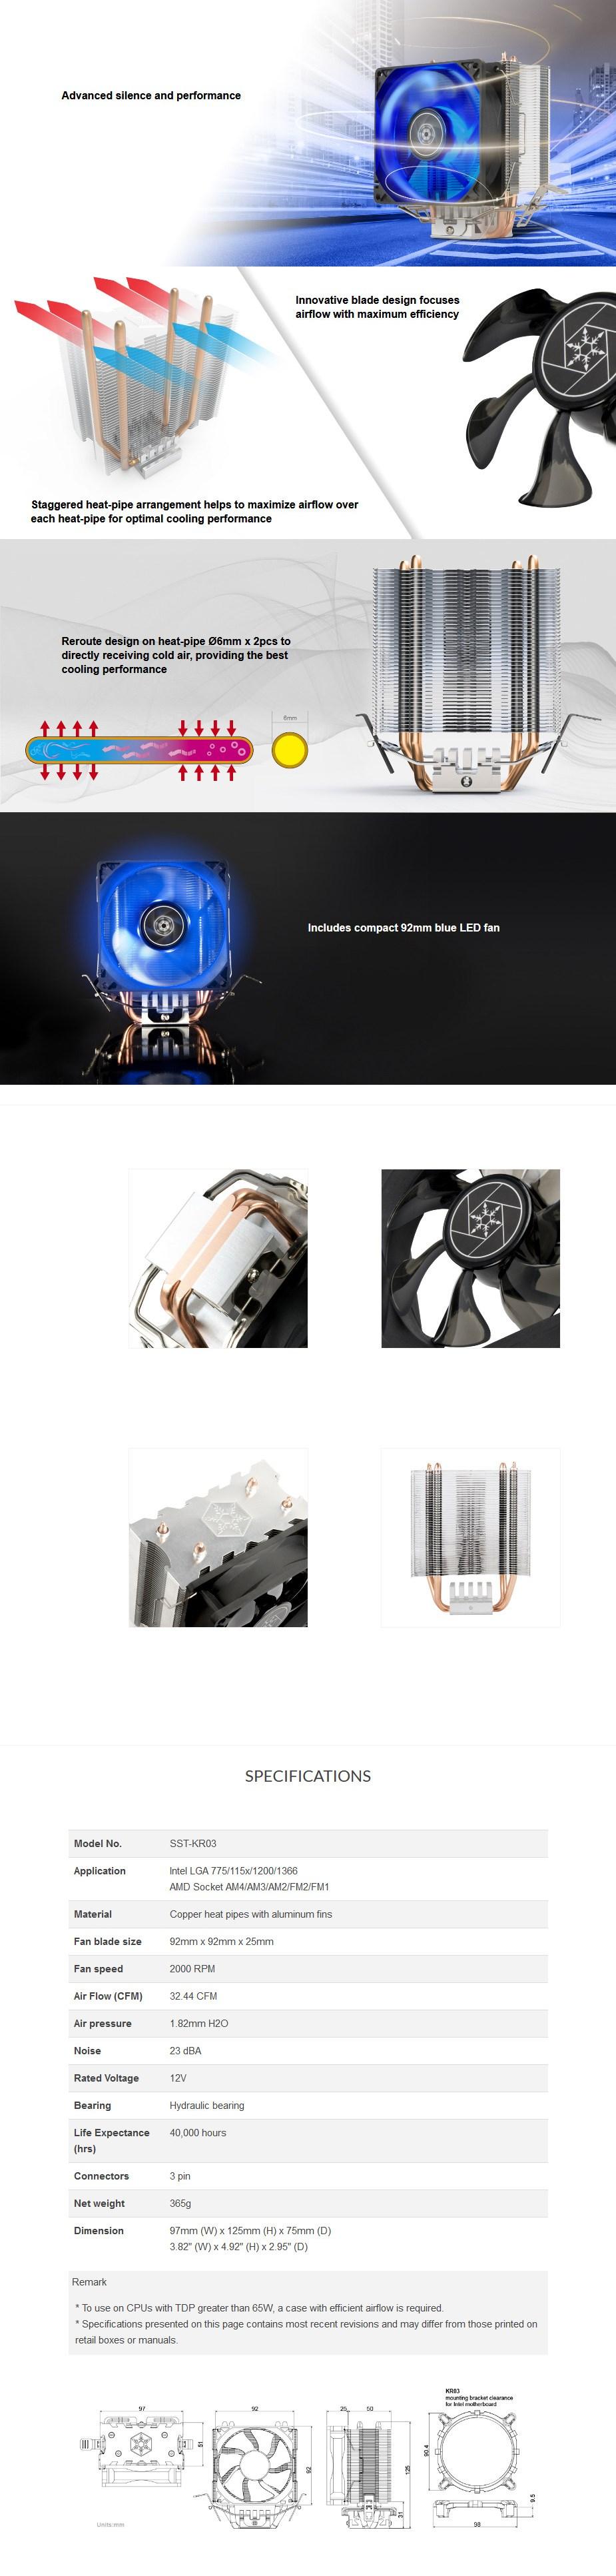 SilverStone KR03 CPU Air Cooler - Overview 1